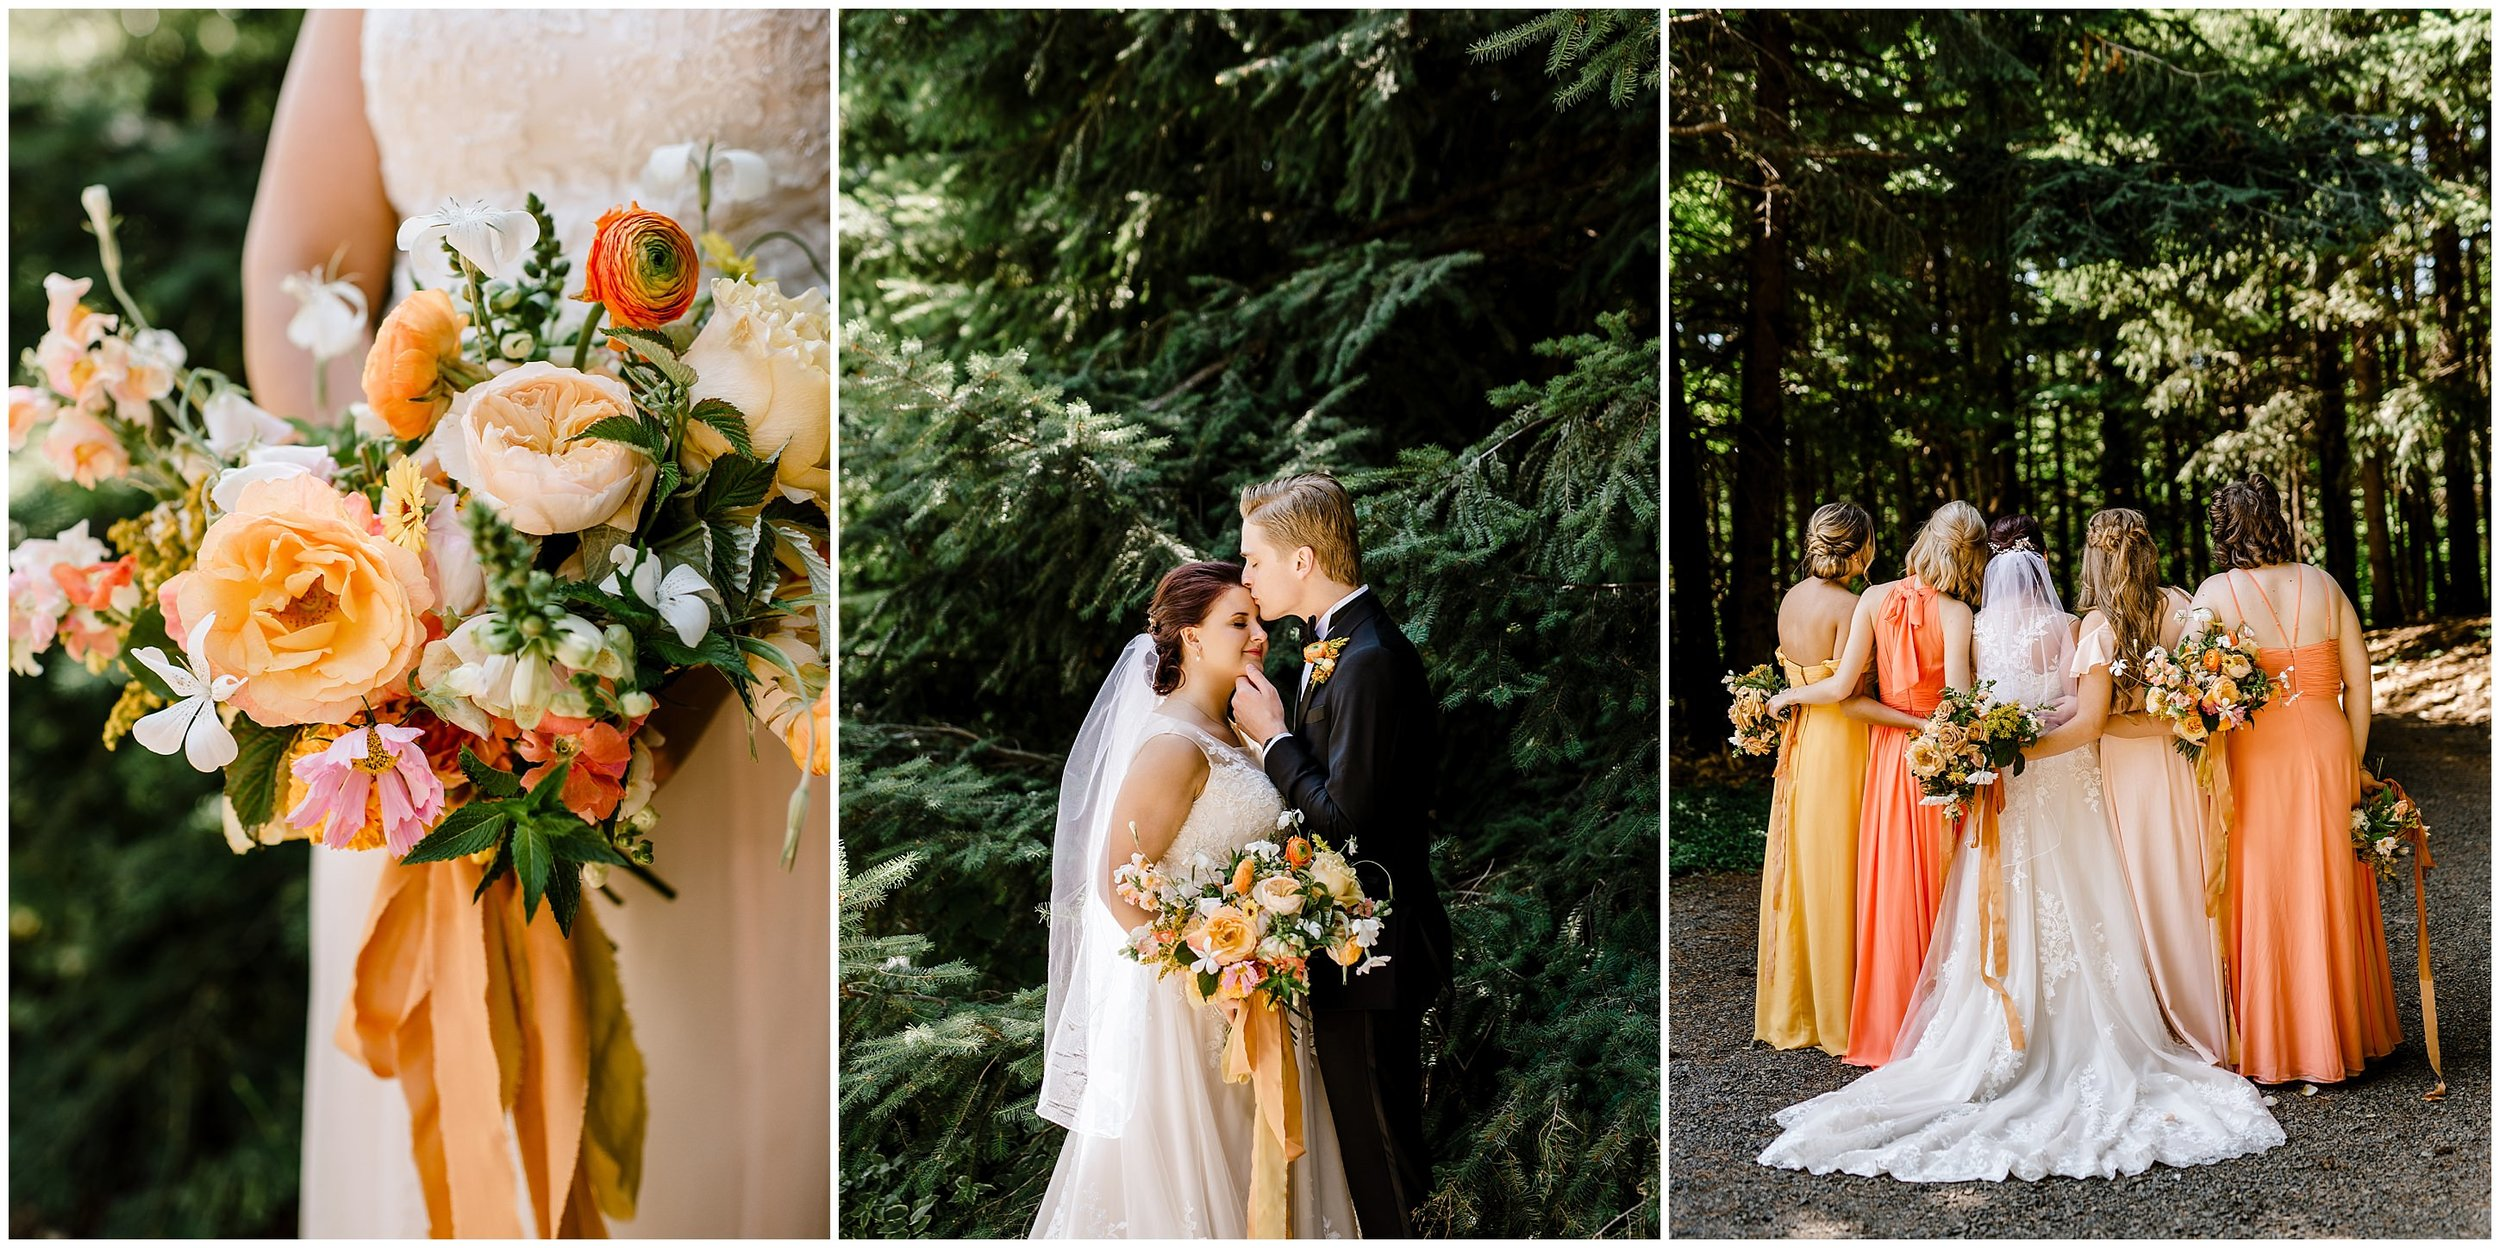 Citrus-inspired-wedding-at-Gorge-Crest-Vineyard-211.jpg